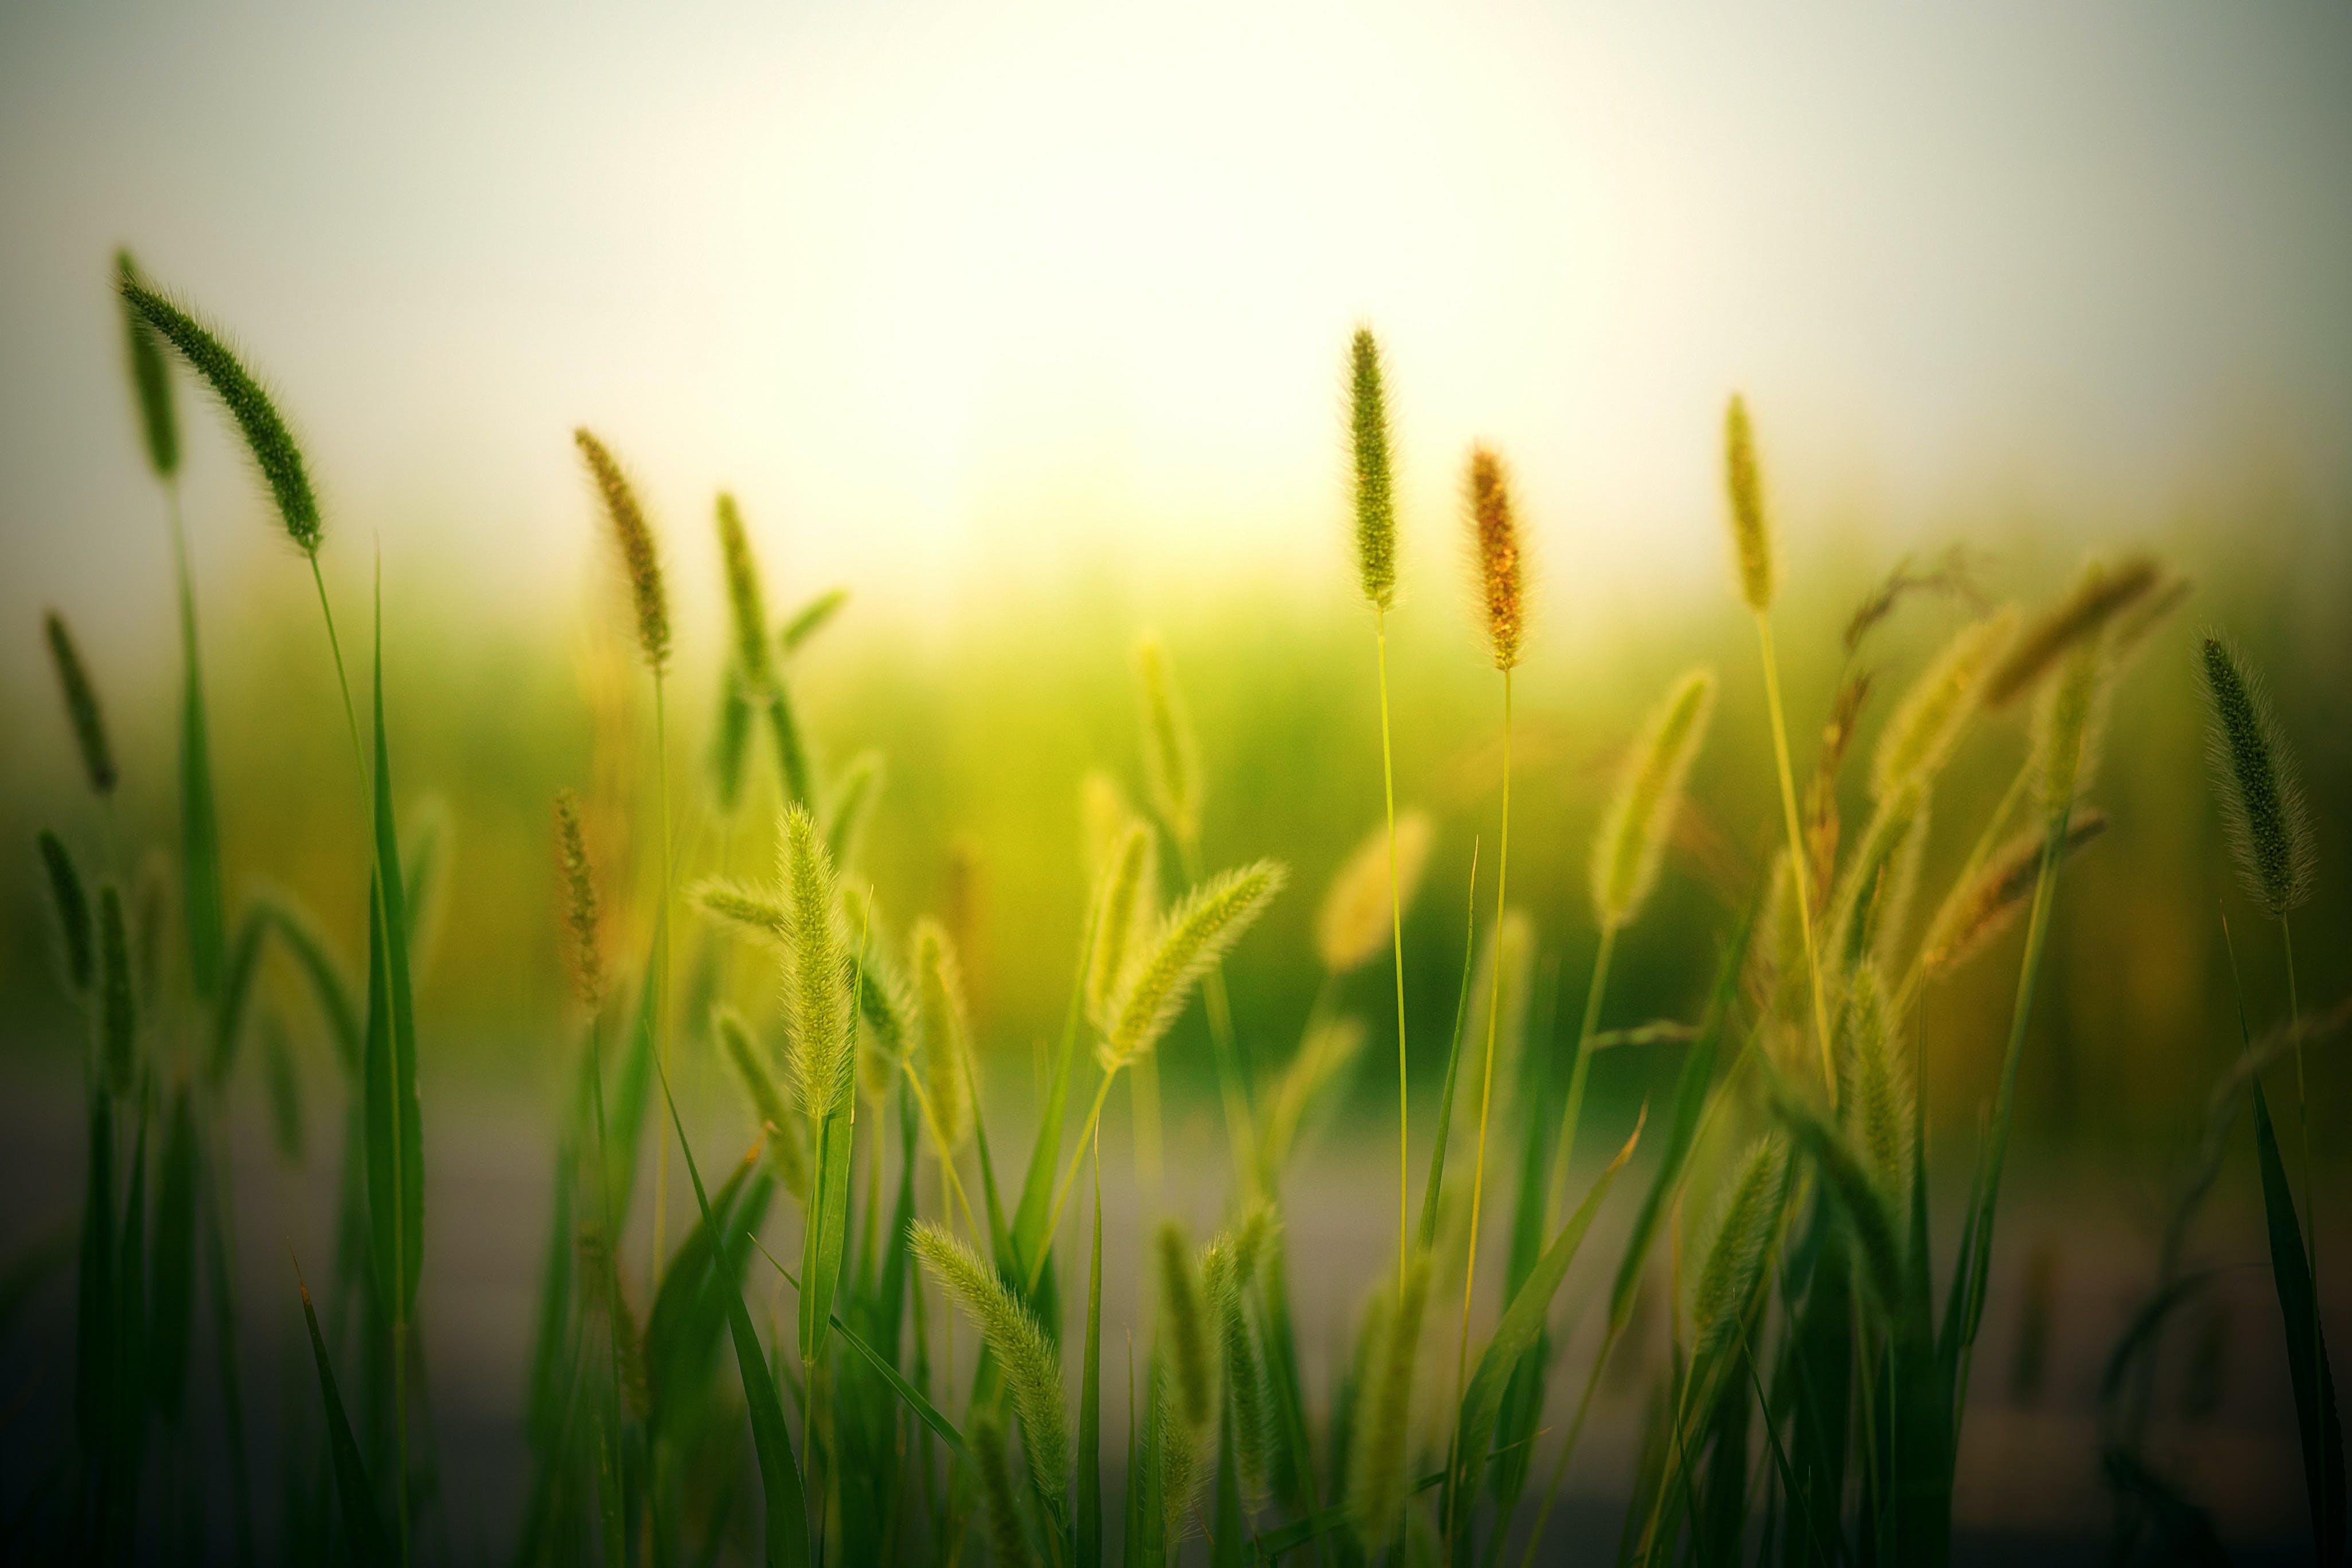 blur, countryside, cropland